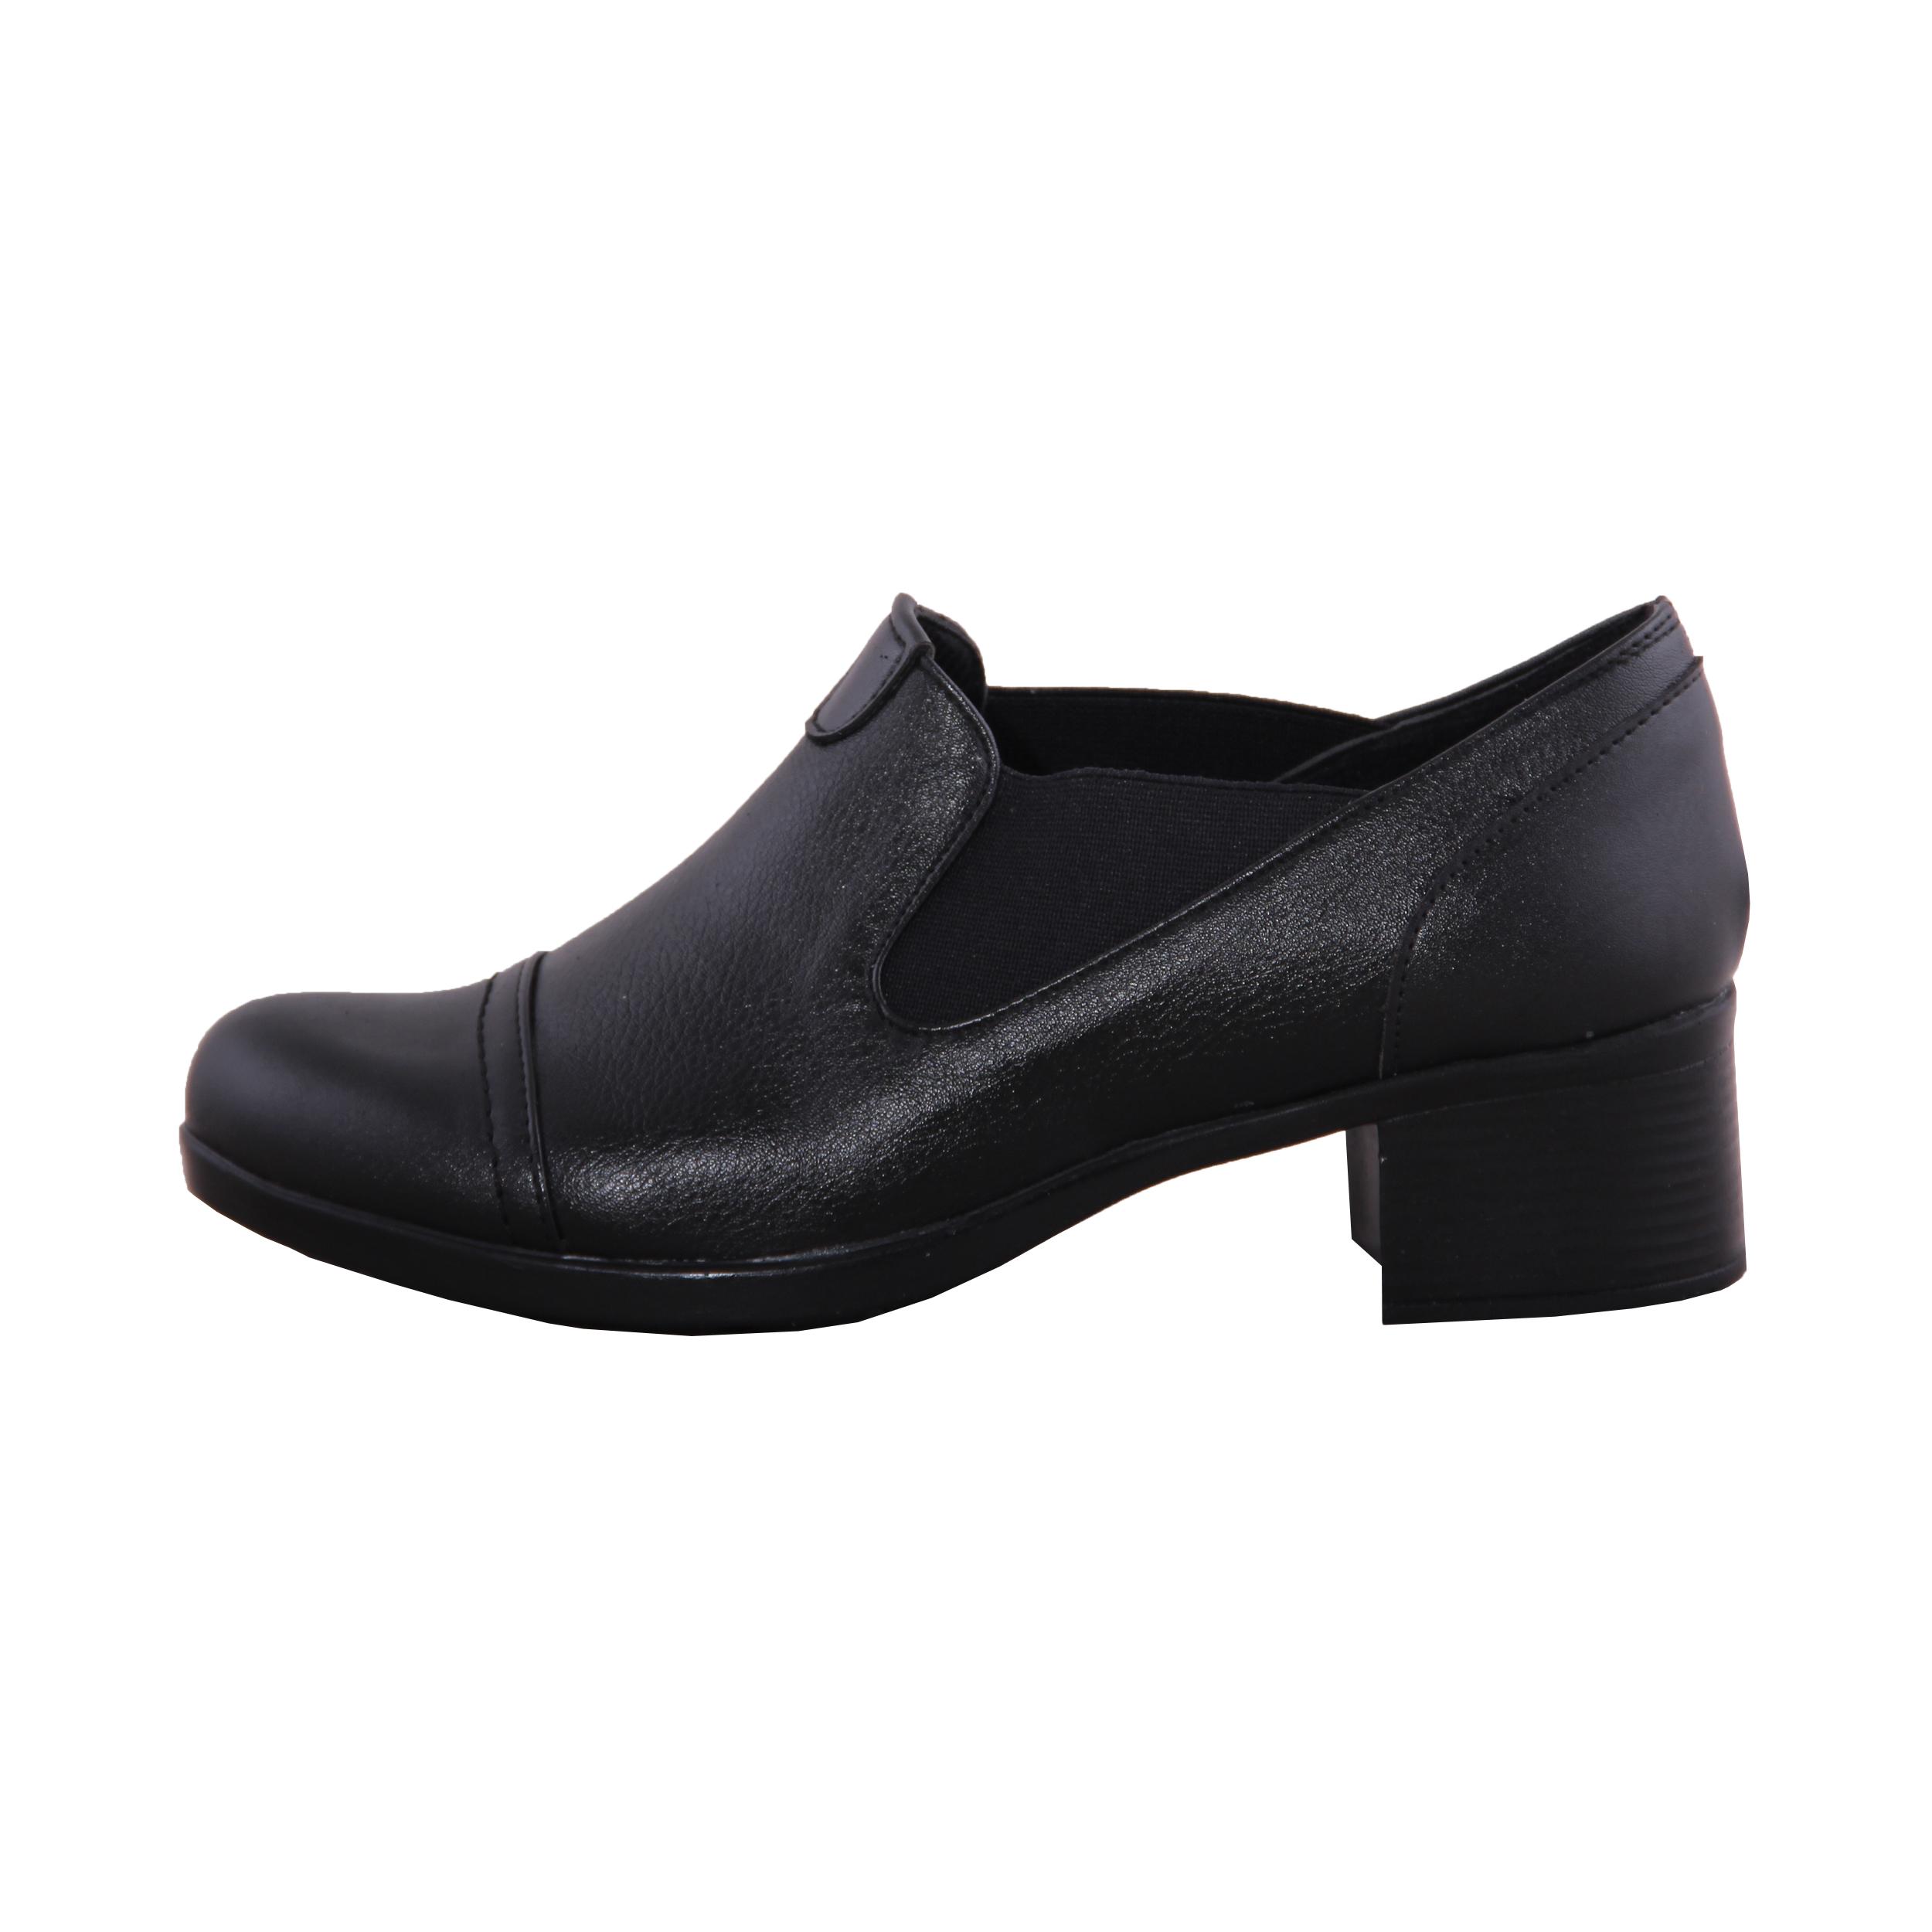 تصویر کفش زنانه کد 1-39958